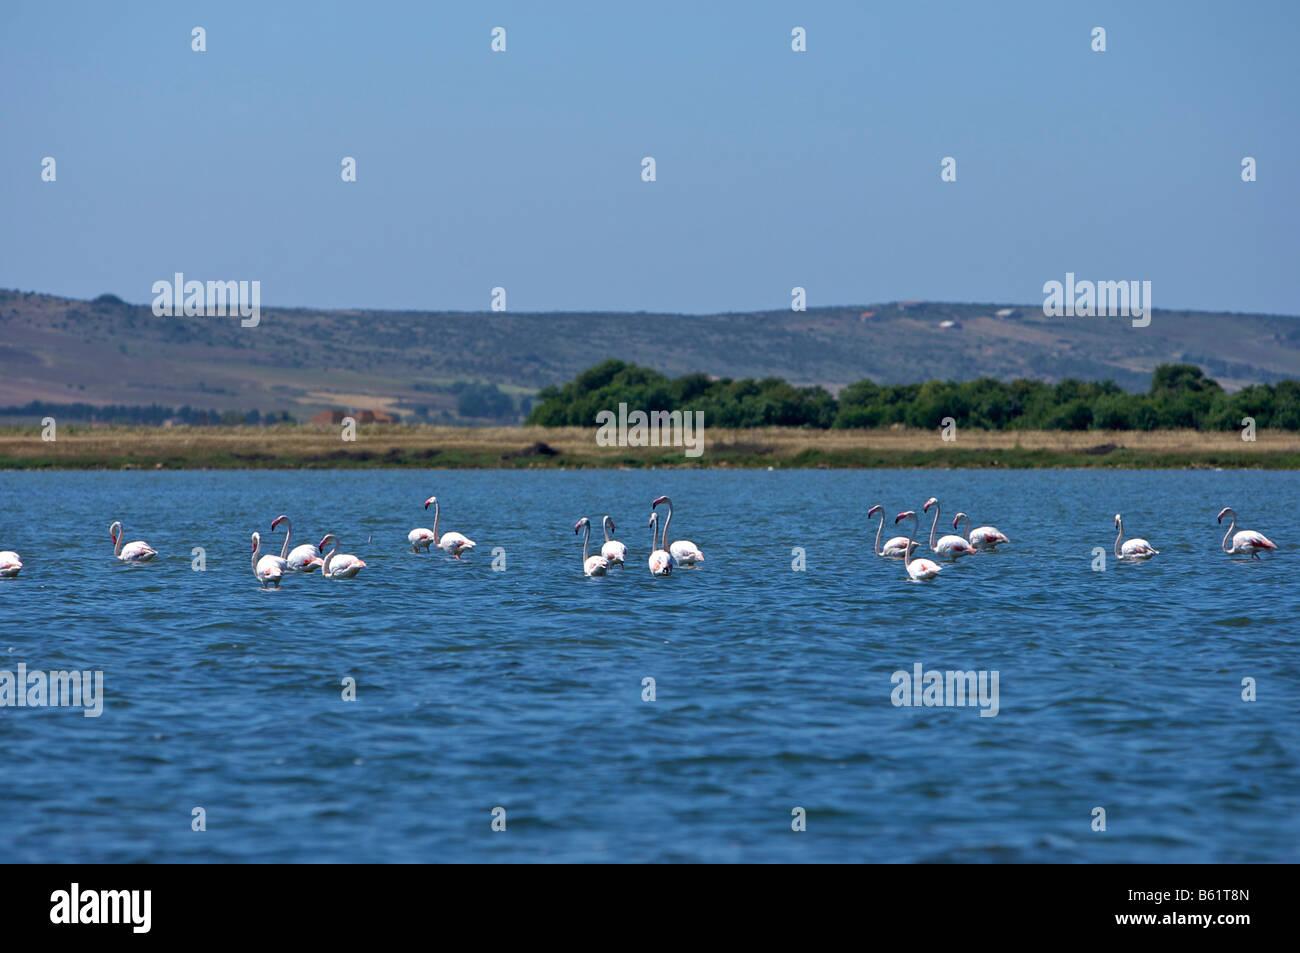 Flamingoes in the Lagune di Mistras, Sinis peninsula, Sardinia, Italy, Europe - Stock Image